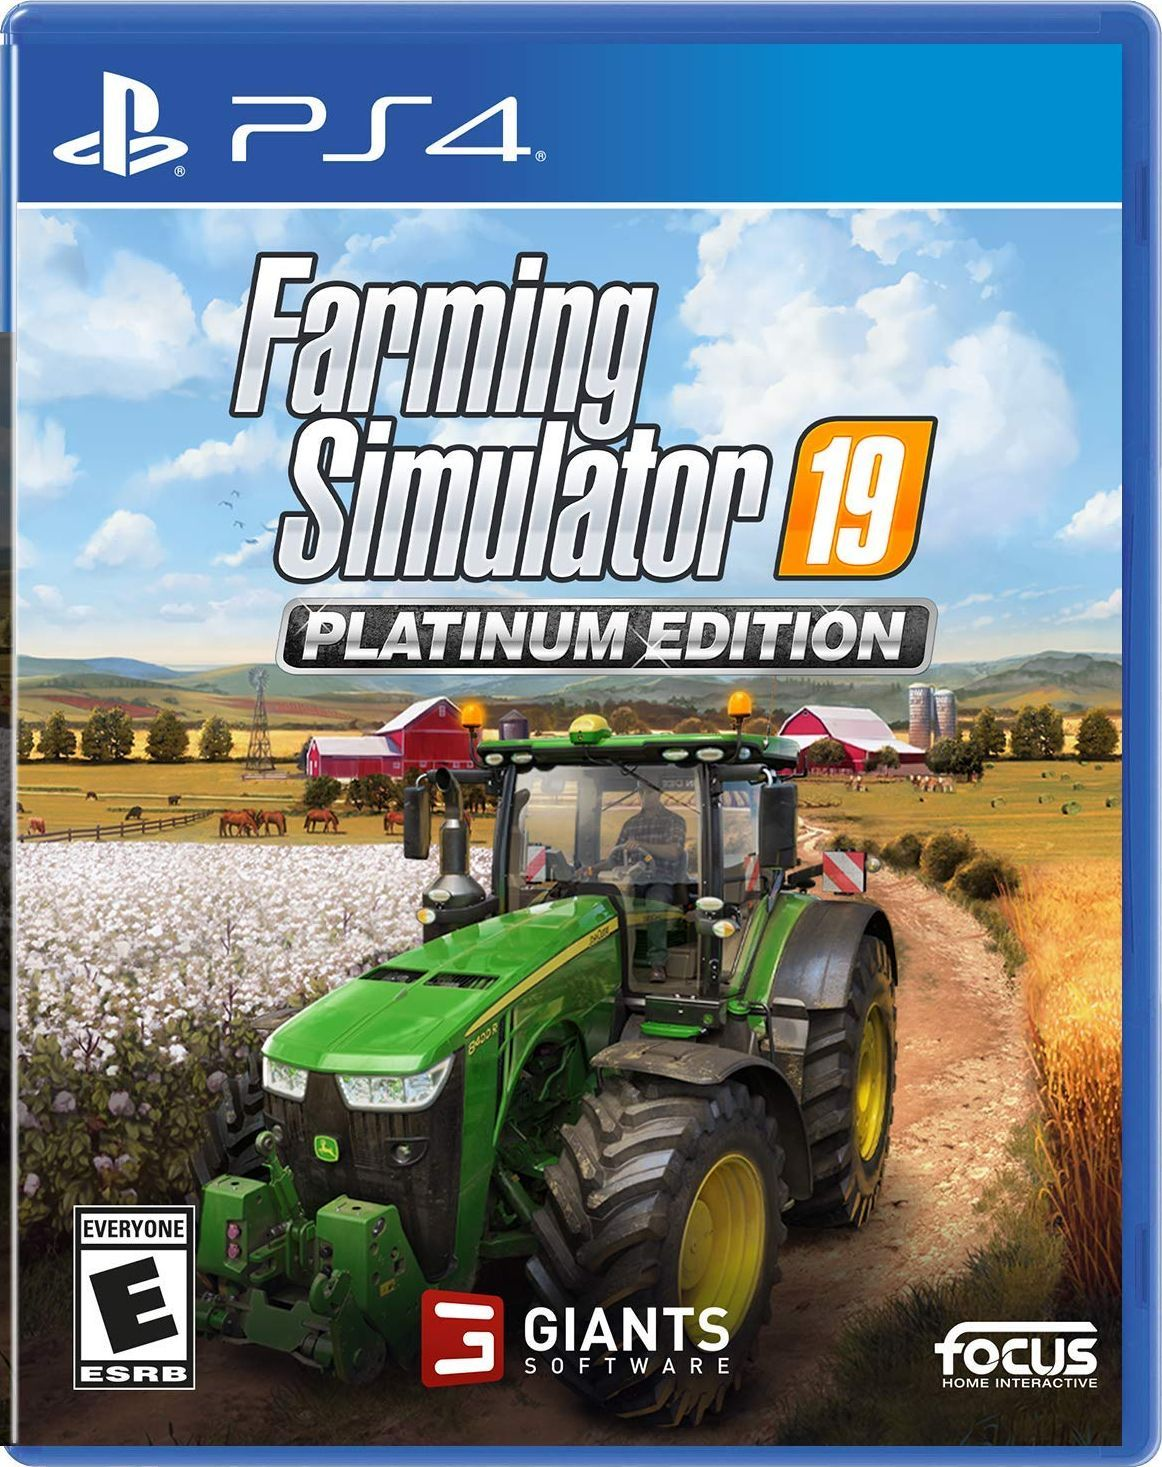 Farming Simulator 19 Platinum Edition Farming simulator